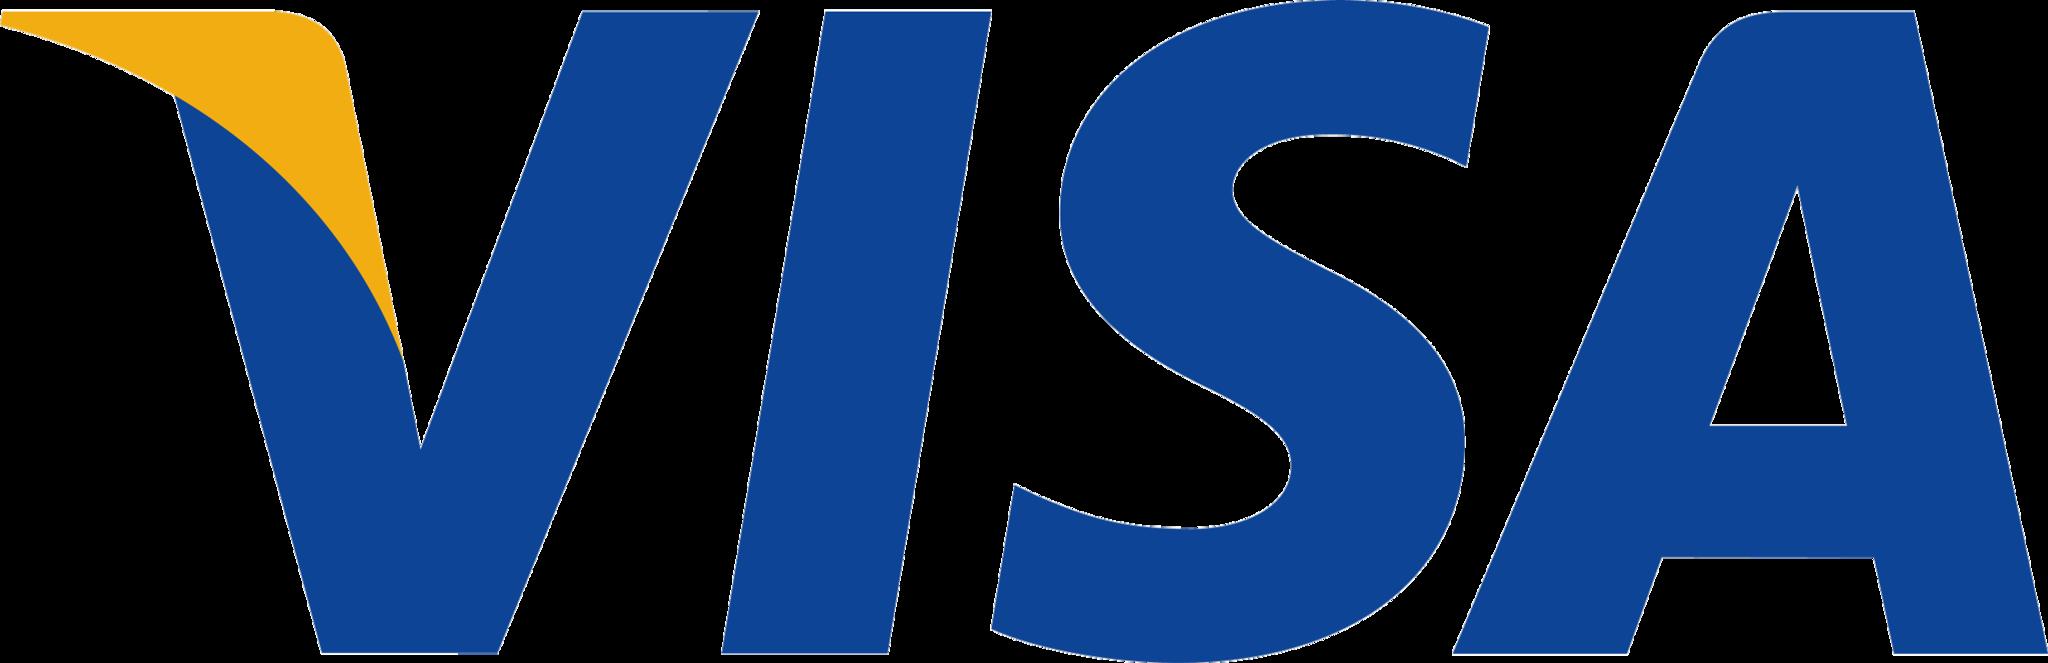 Visa creditcard betaalmethode